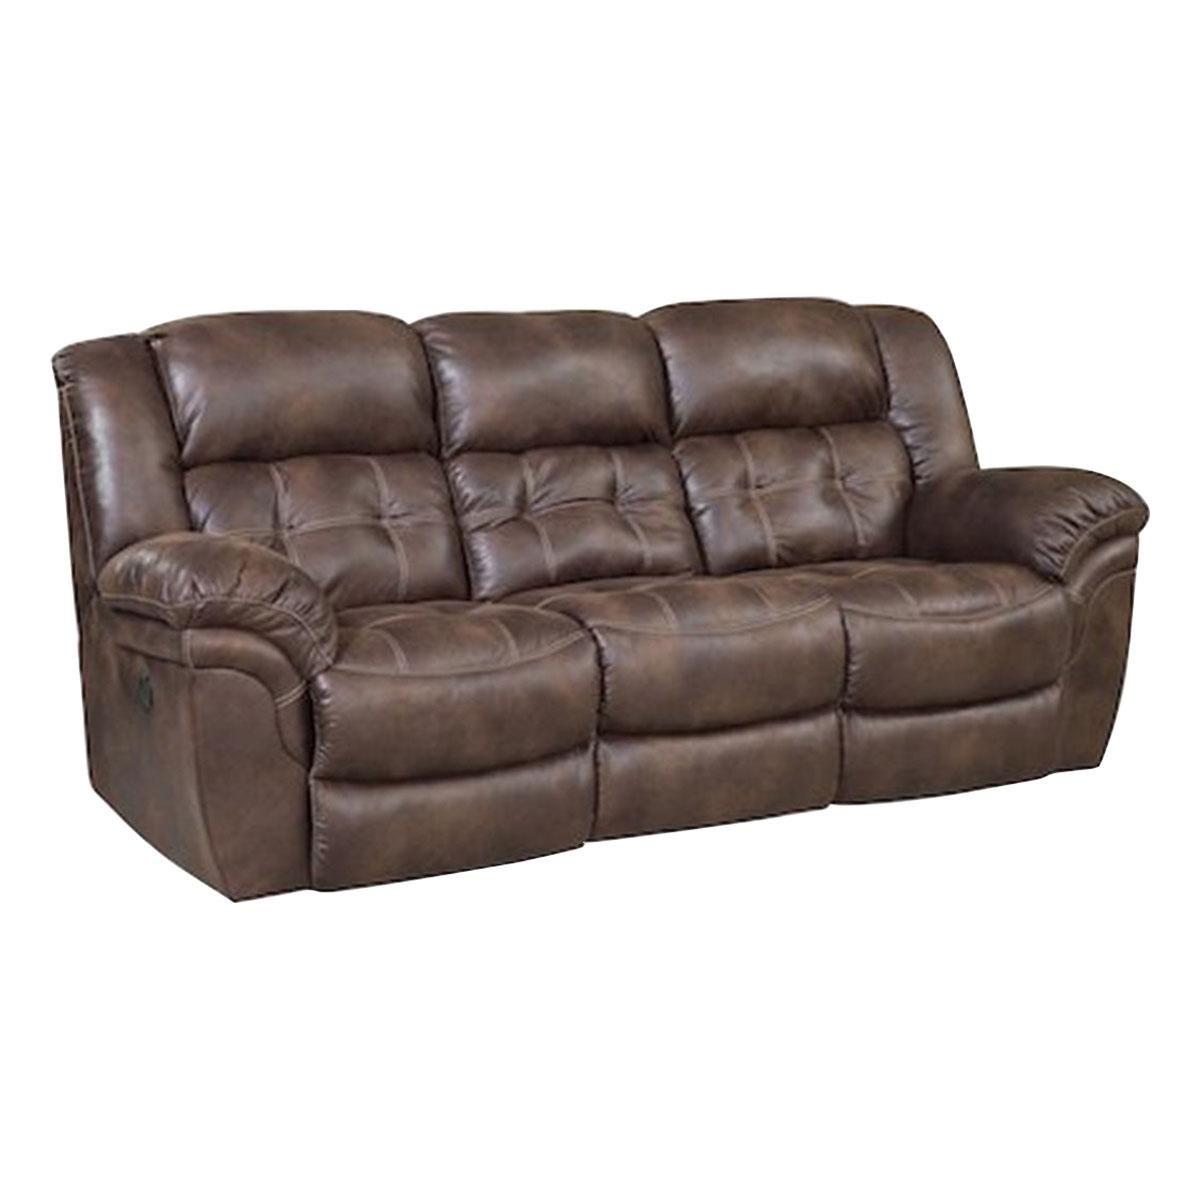 Nettleton Frontier Double Reclining Sofa In Chocolate Nebraska Furniture Mart Reclining Sofa Sofa Recliner